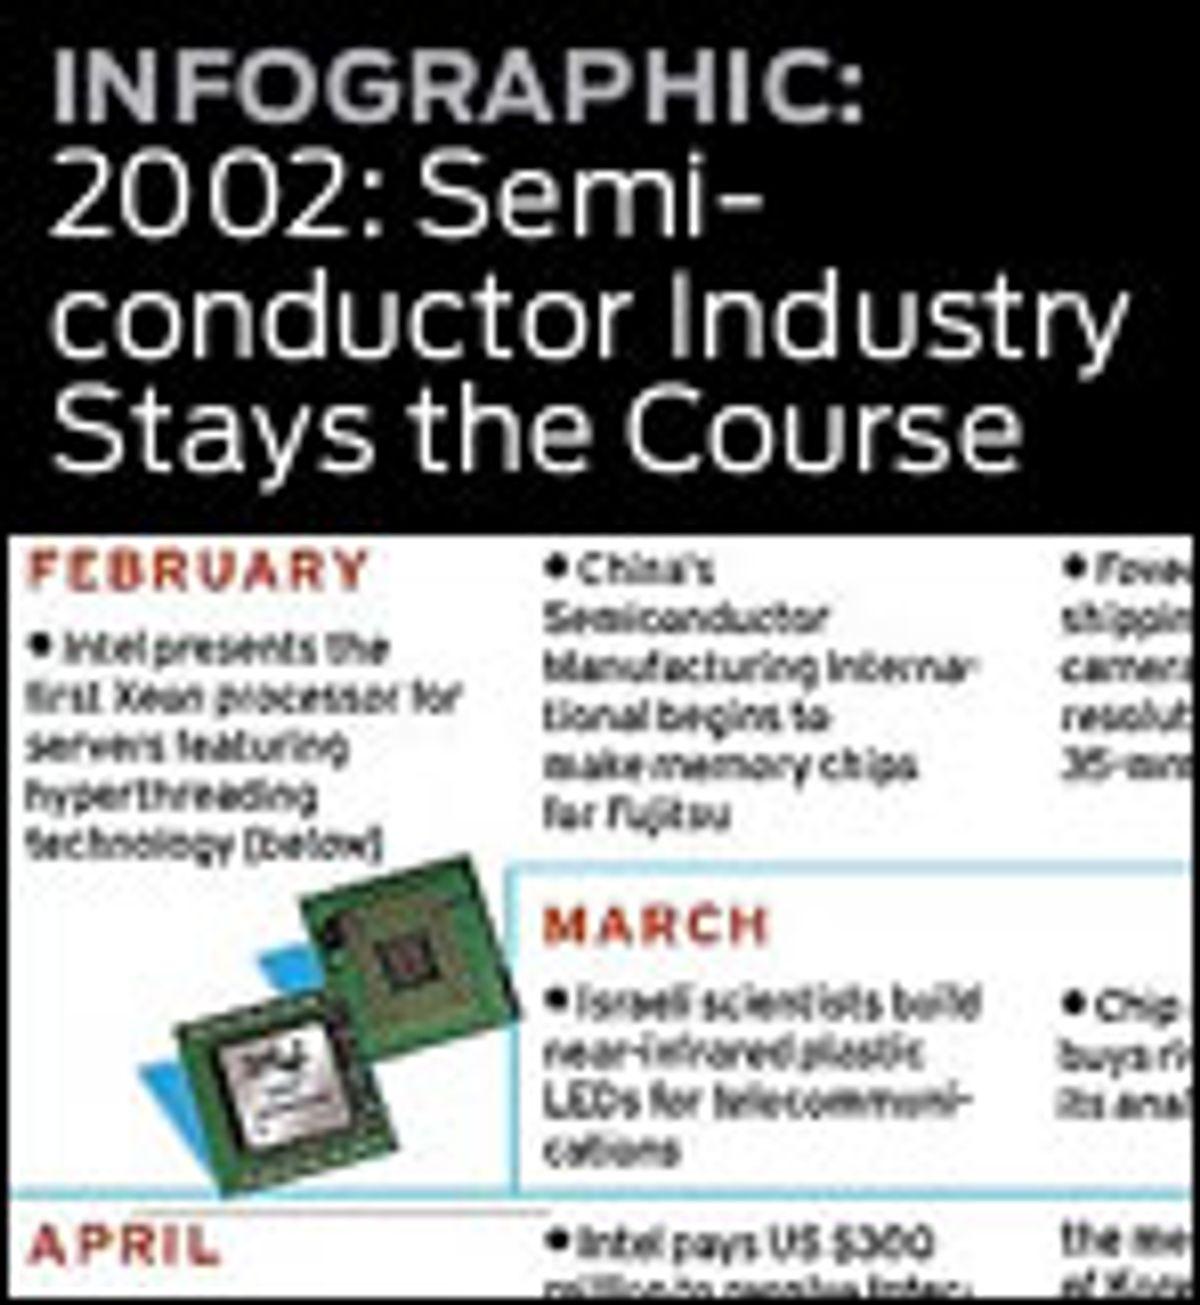 A Sea Change for Semiconductors